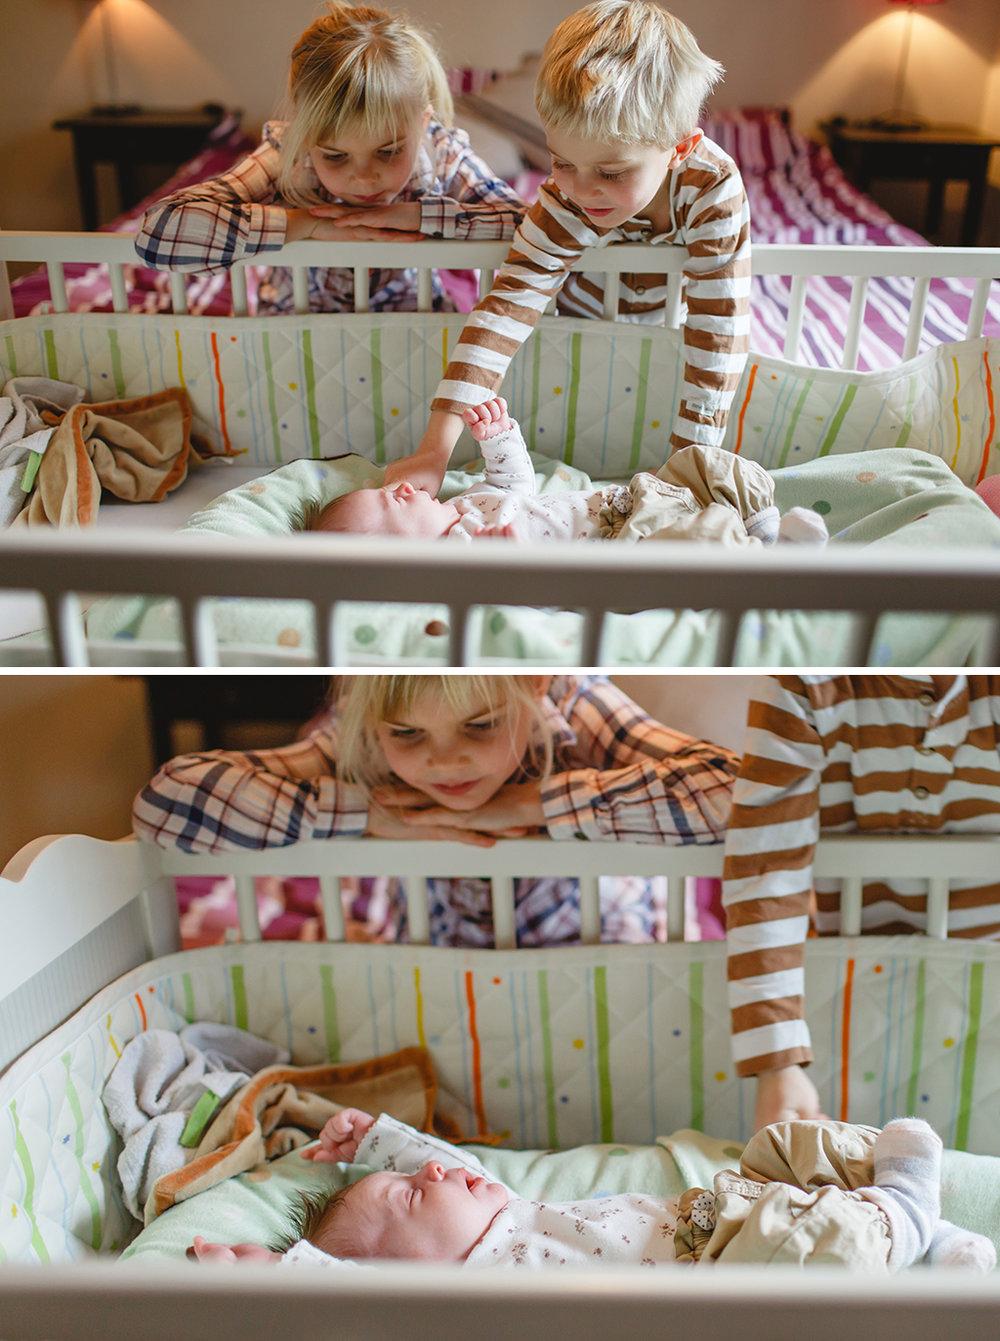 Nyfoddfotografering-lifestyle-familjefotografering-Stockholm-6.jpg